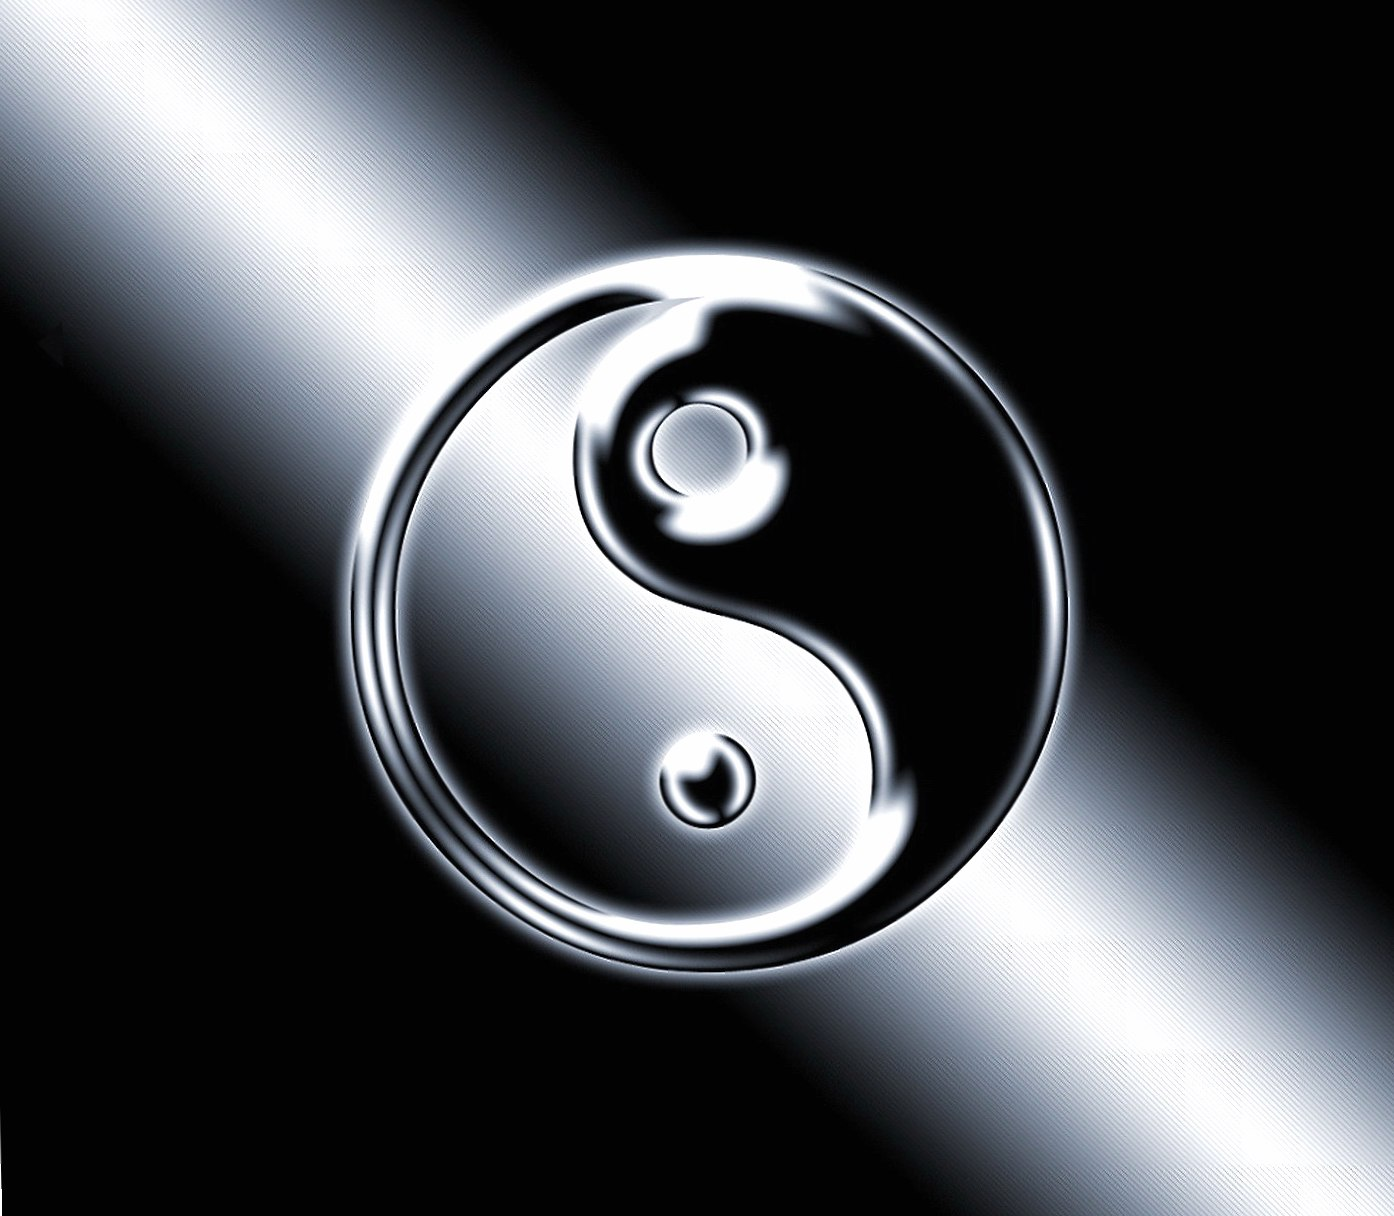 Yin-yang Symbol wallpapers HD quality